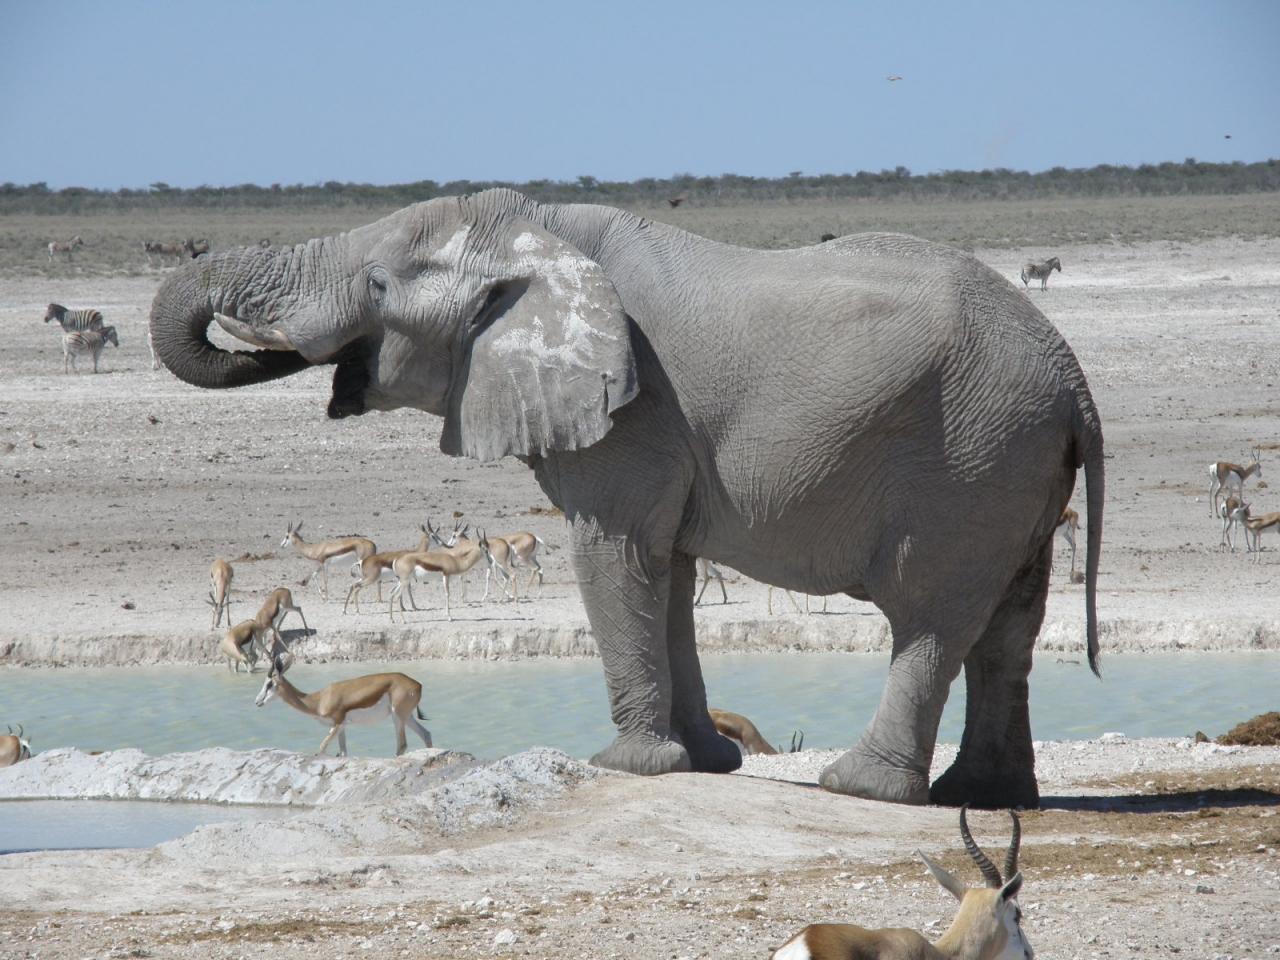 2013.GW ナミビア旅行記7  エトーシャ...